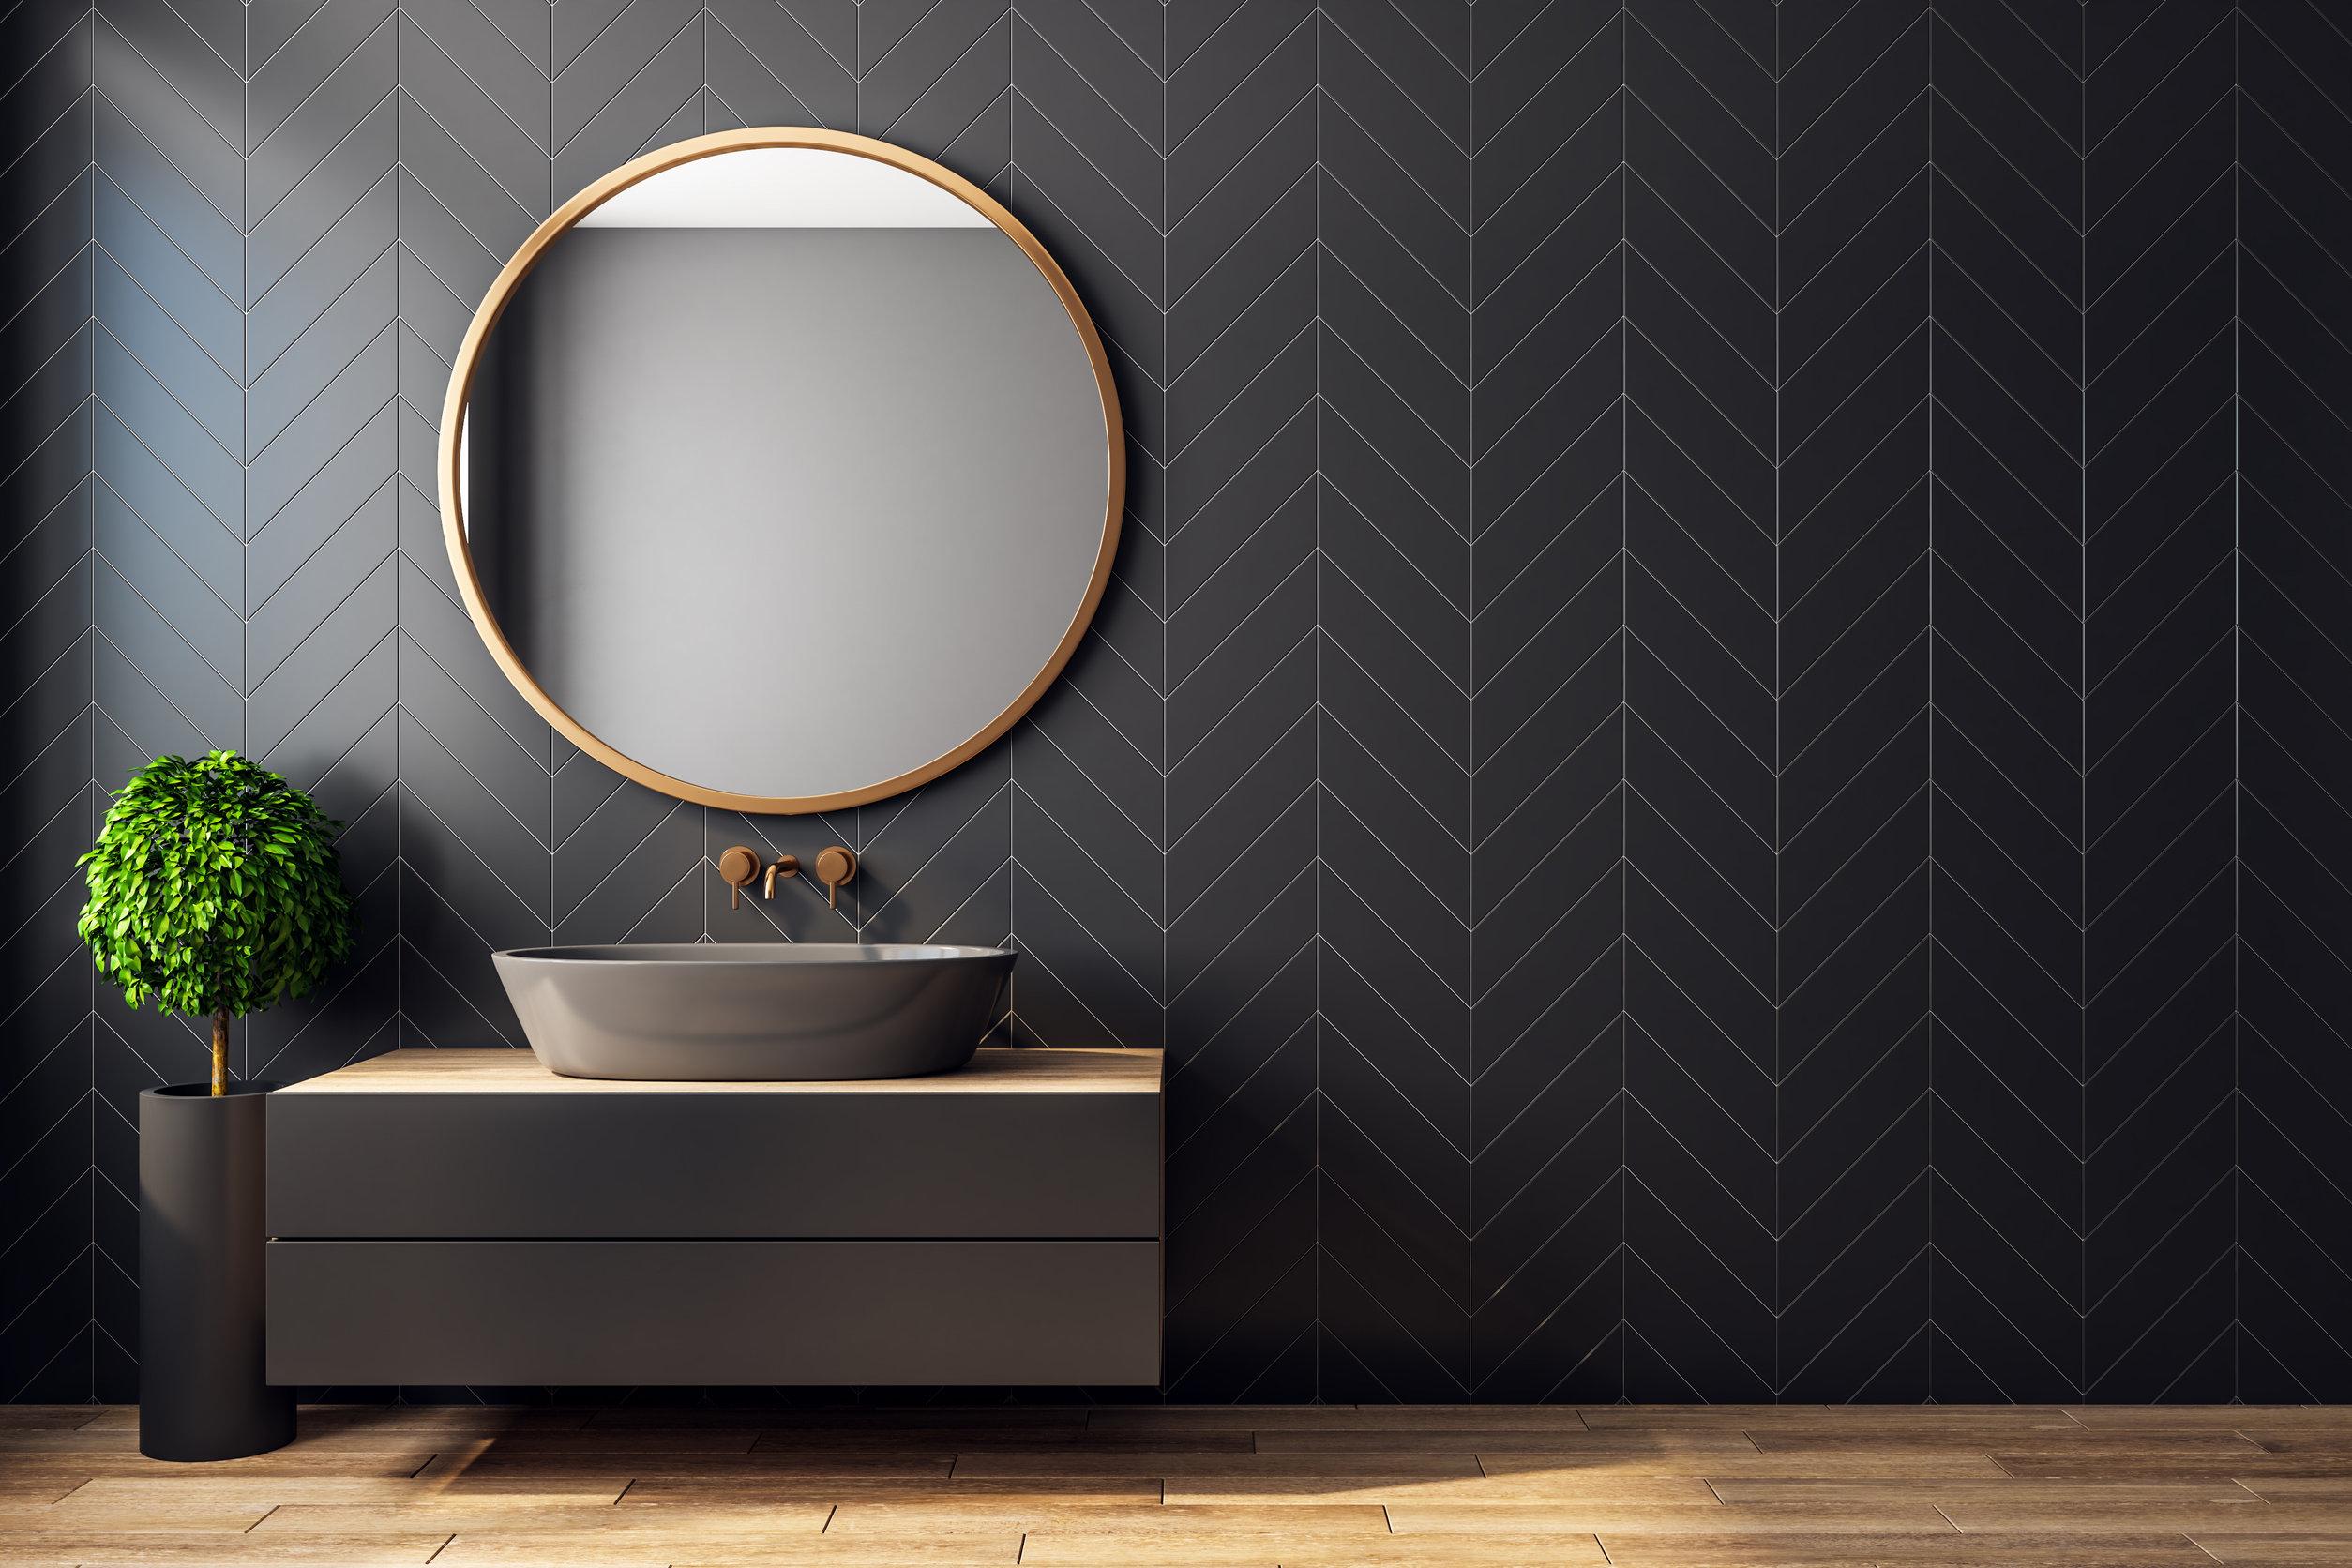 Interior de baño negro moderno con árbol decorativo, lavabo, espejo redondo, luz solar